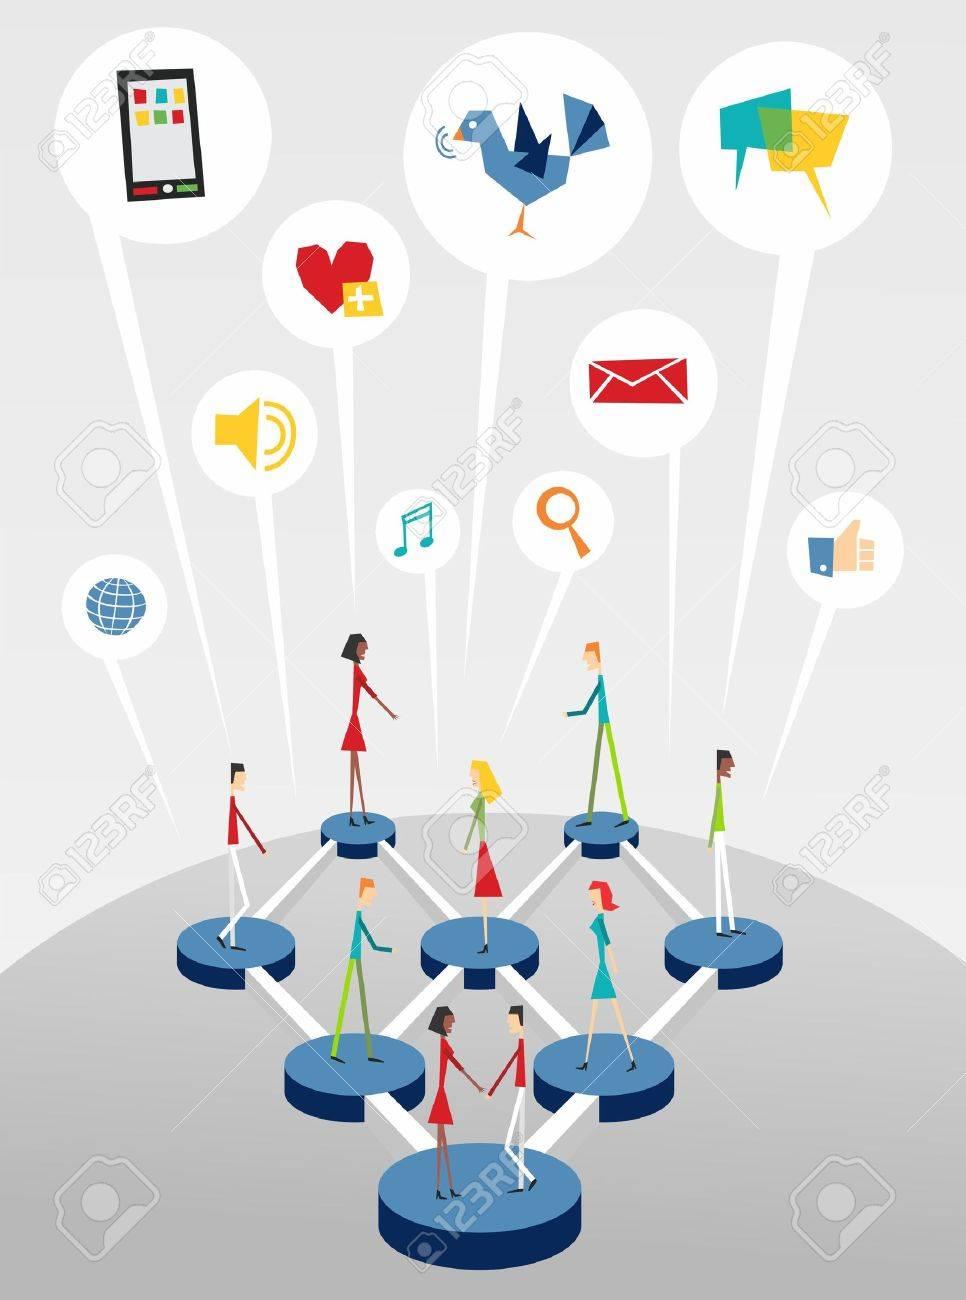 Global Social Network Relationship Diagram Over Light Grey